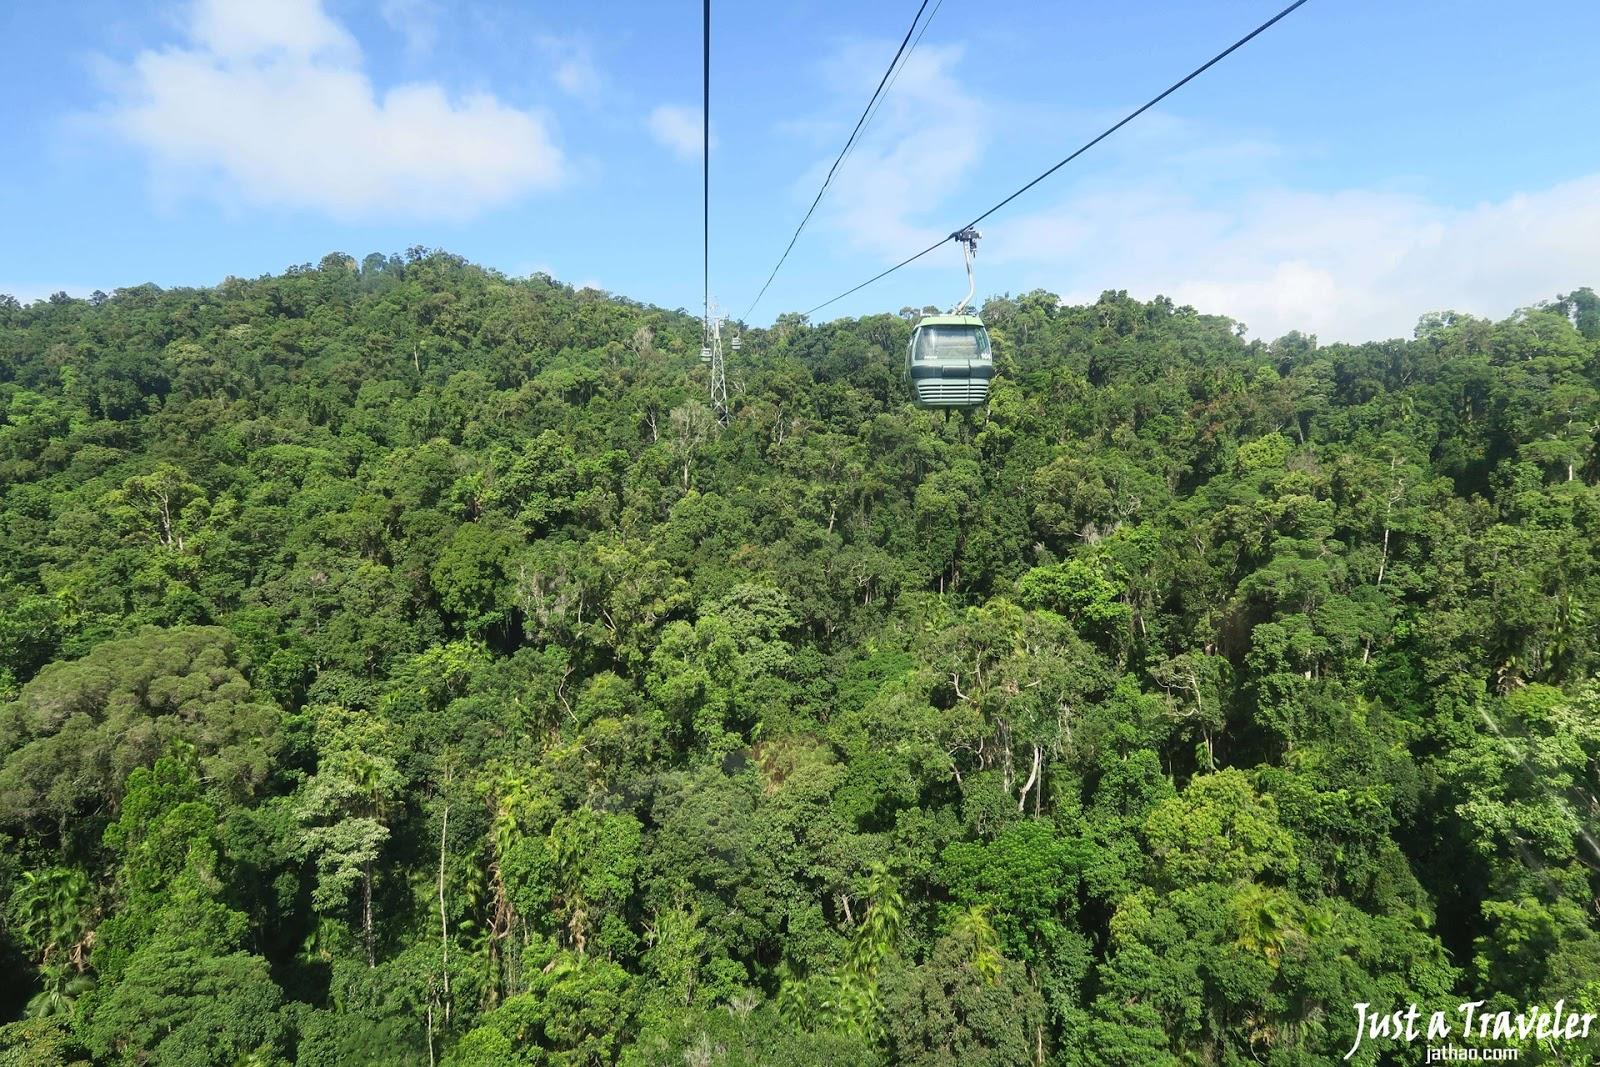 凱恩斯-景點-推薦-庫蘭達-纜車-旅遊-自由行-澳洲-Cairns-Tourist-Attraction-Kuranda-Cableway-Travel-Australia